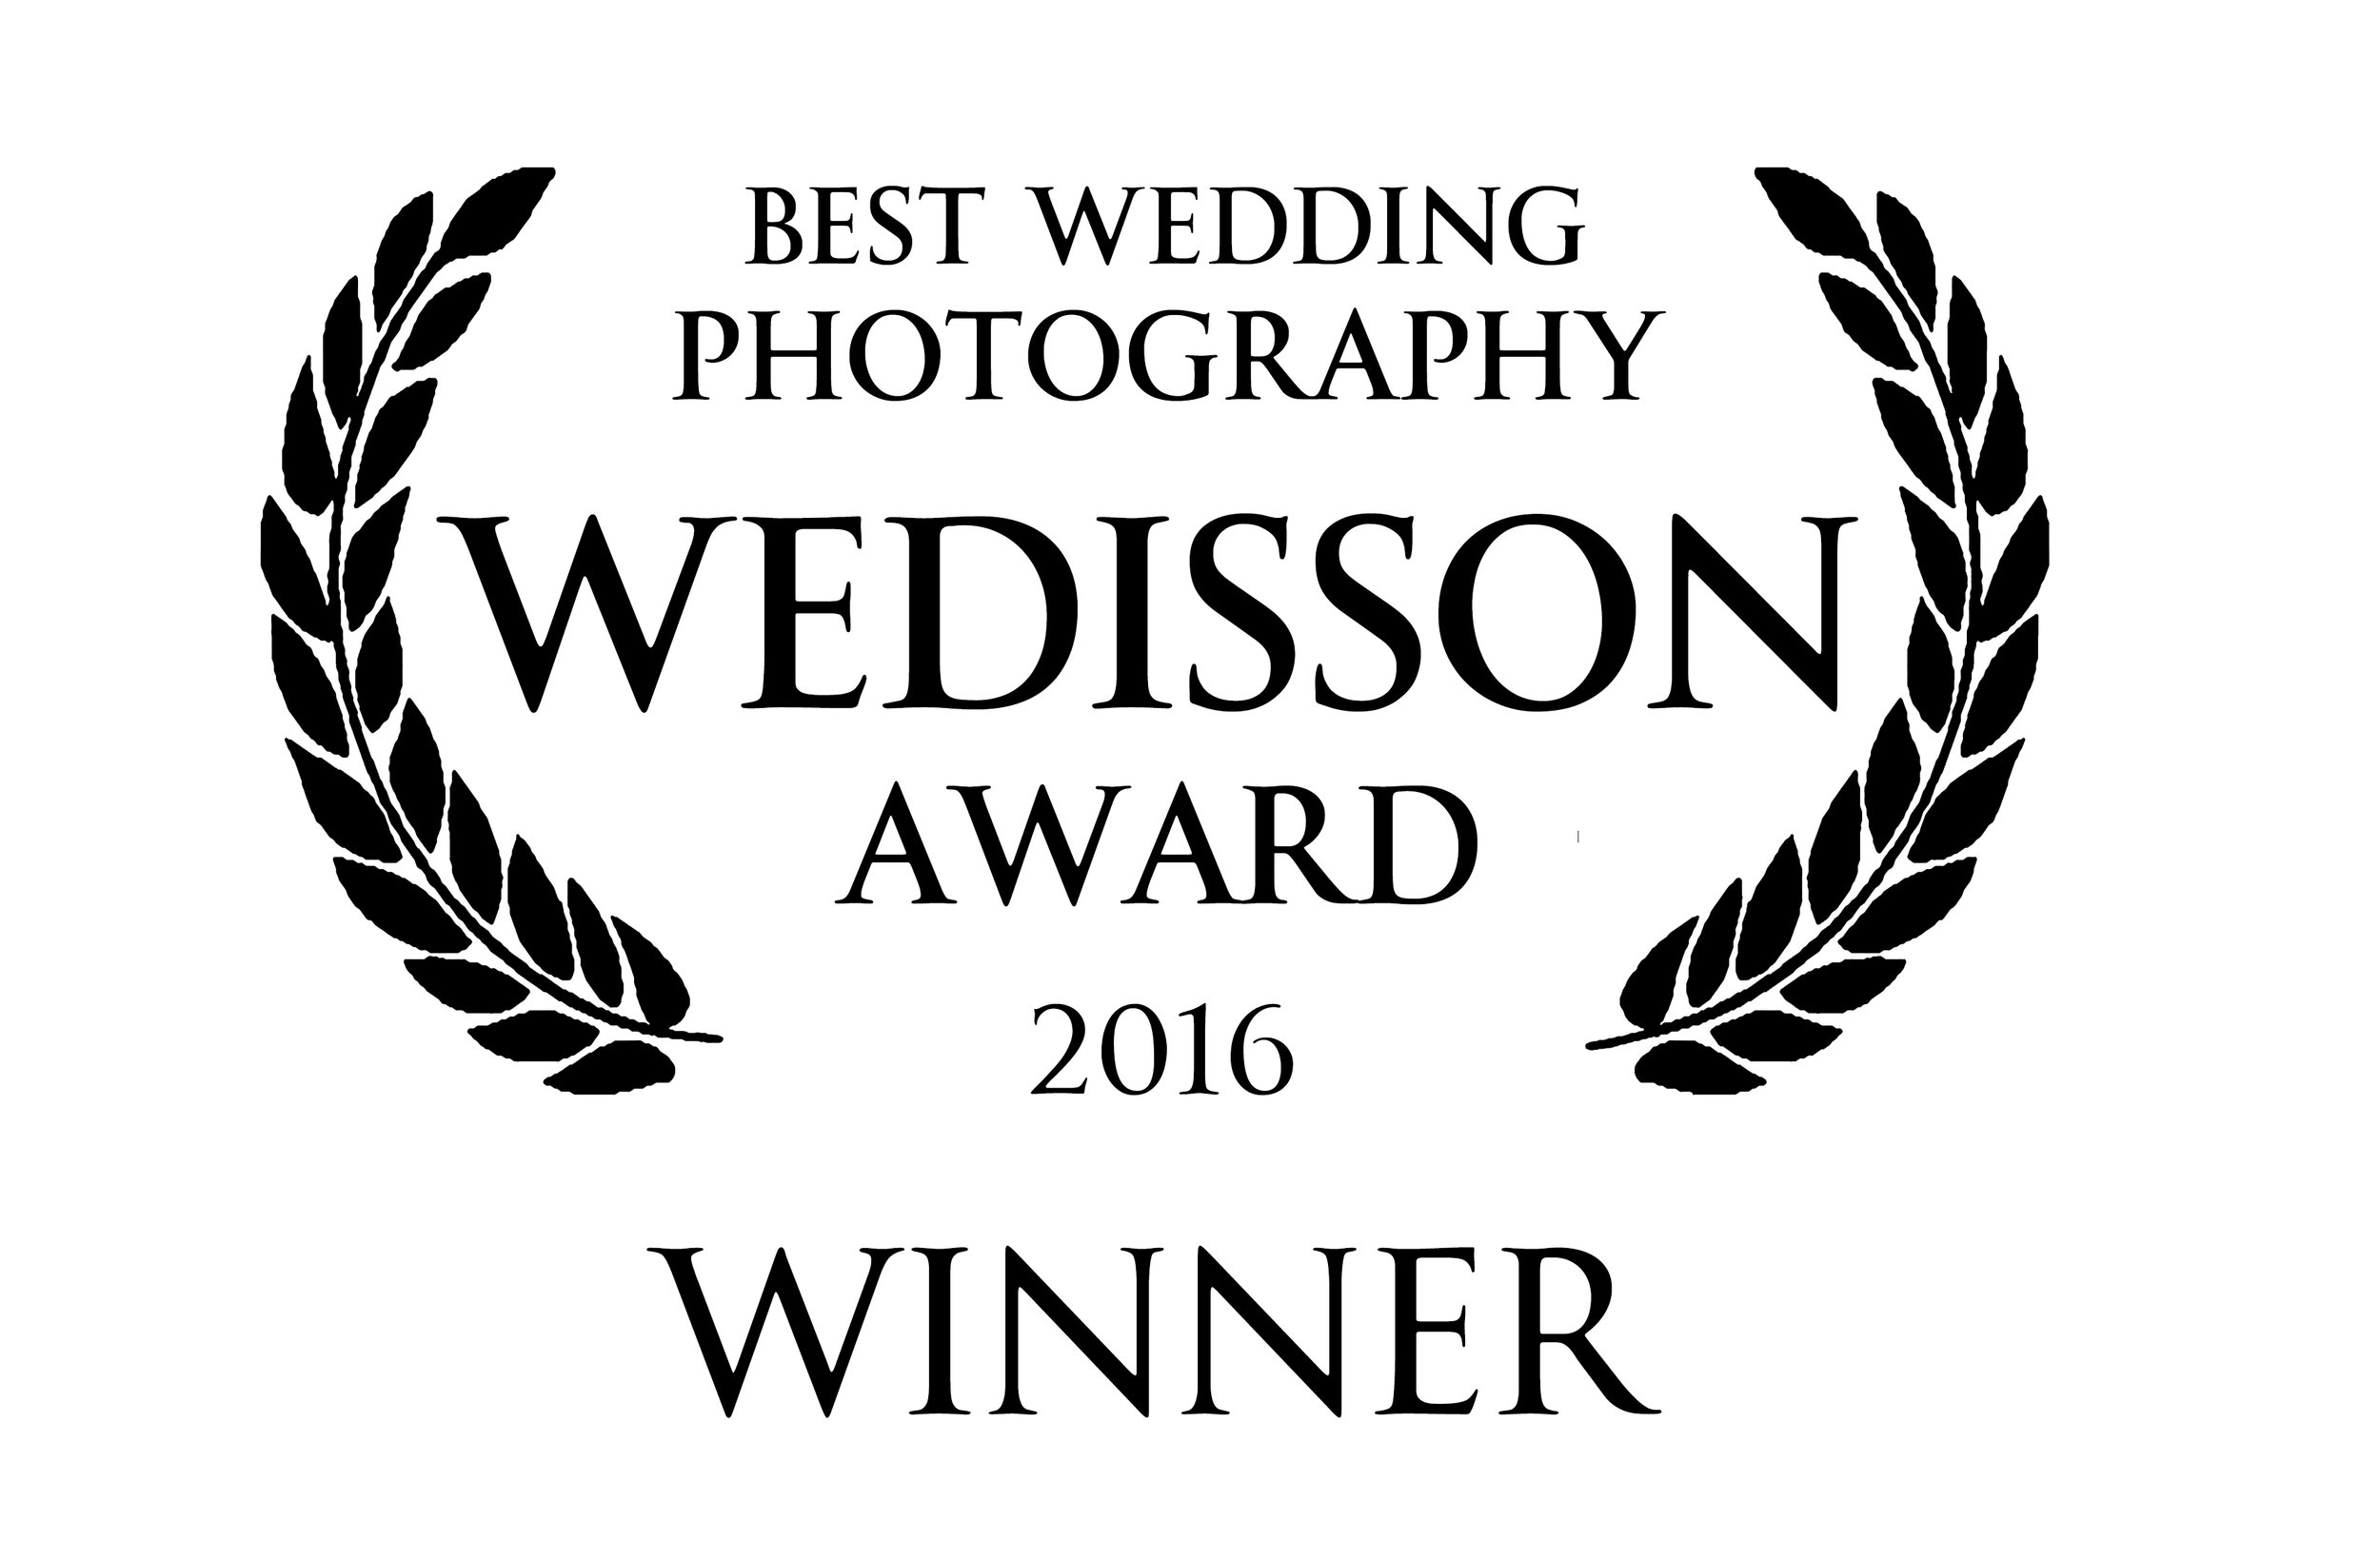 Wedisson-logo-white-bg.jpg